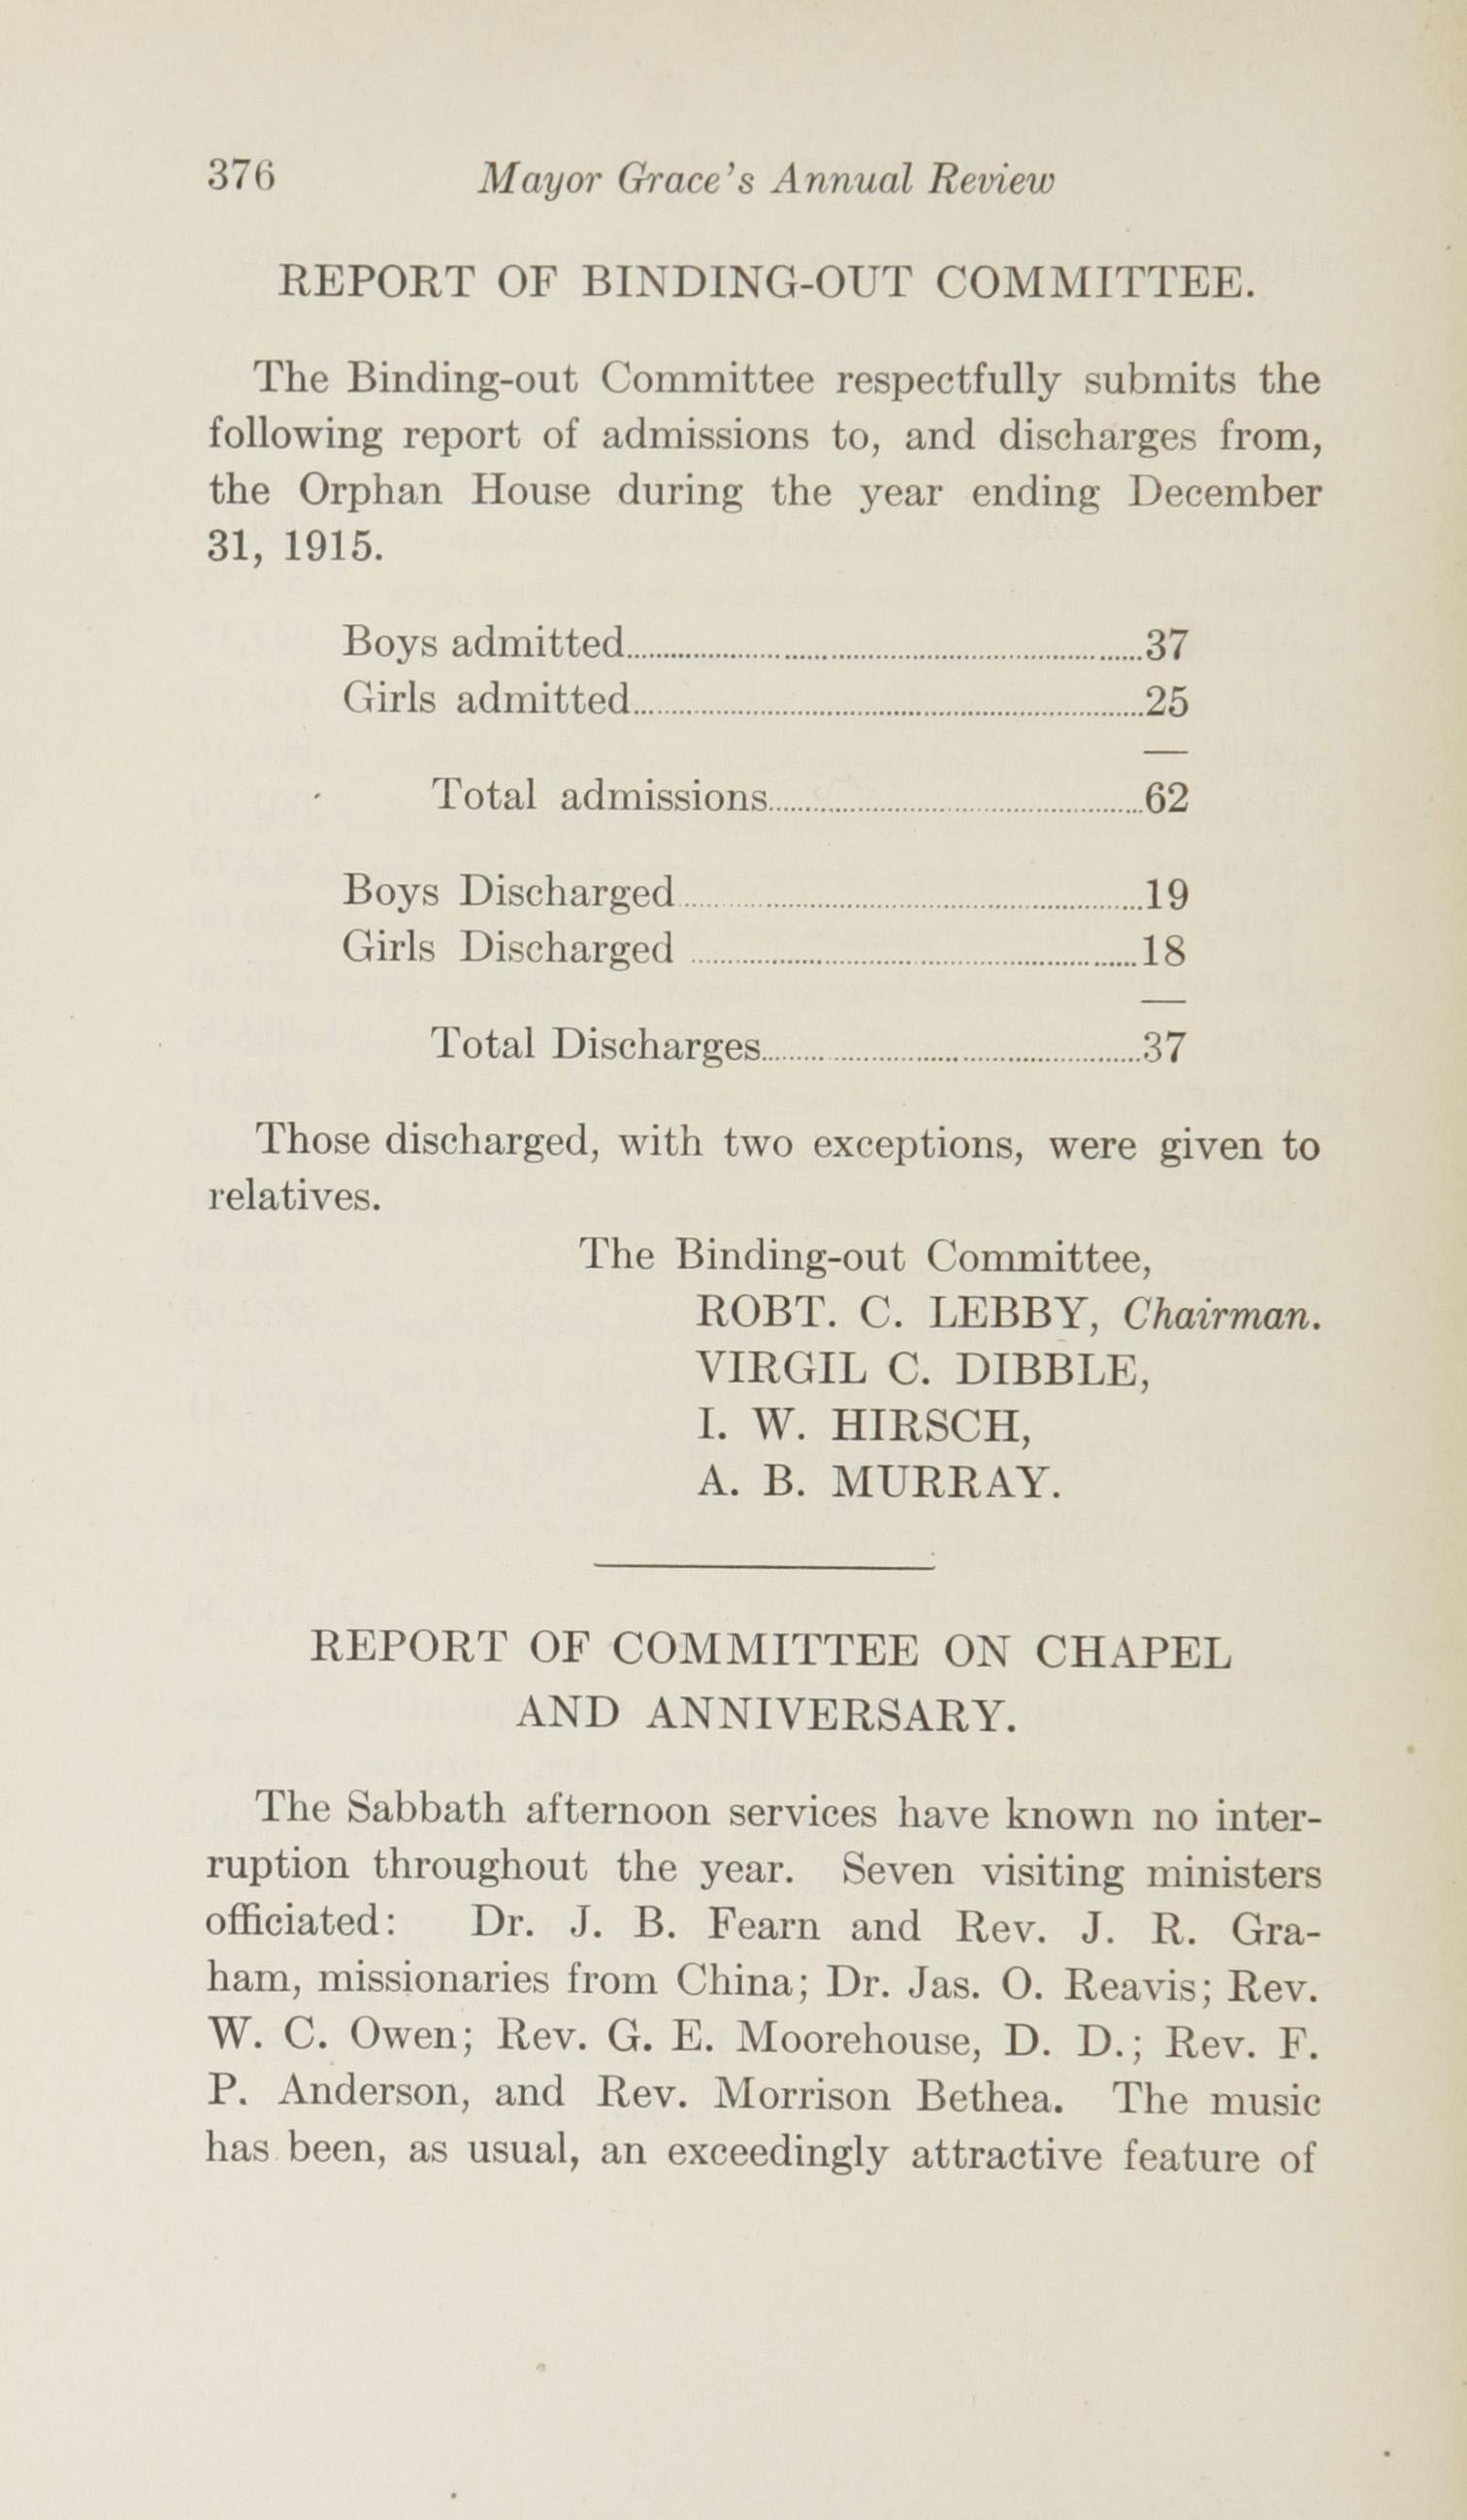 Charleston Yearbook, 1915, page 376